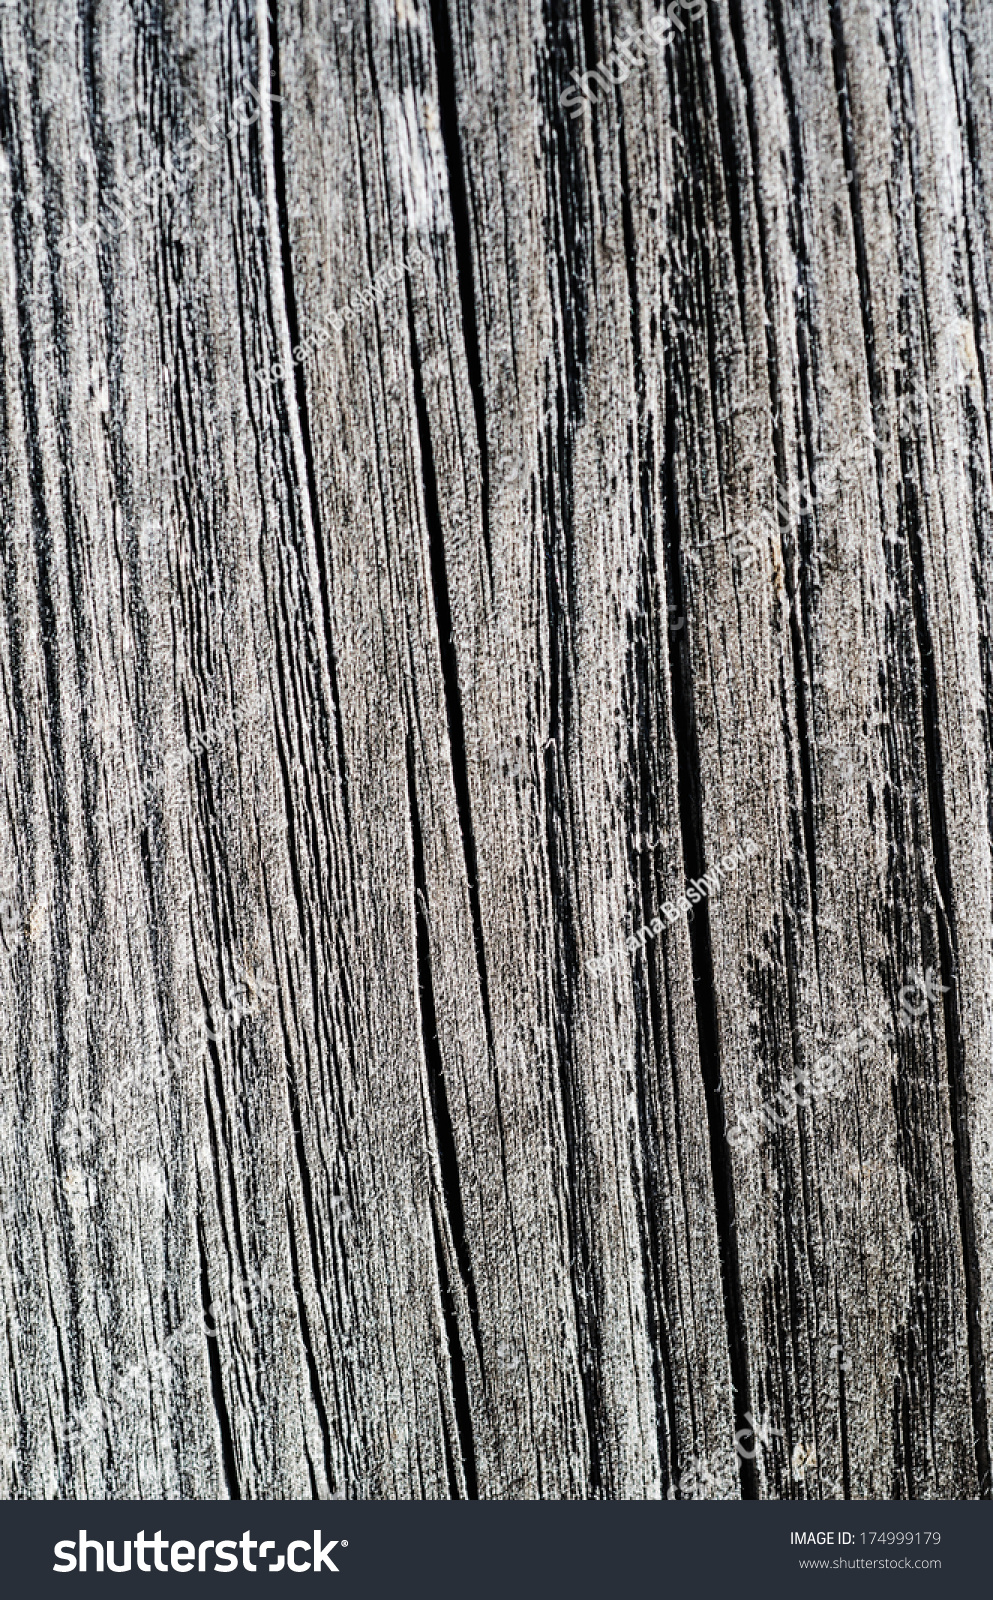 Wooden Desk Background ~ Texture wooden striped desk natural grunge stock photo